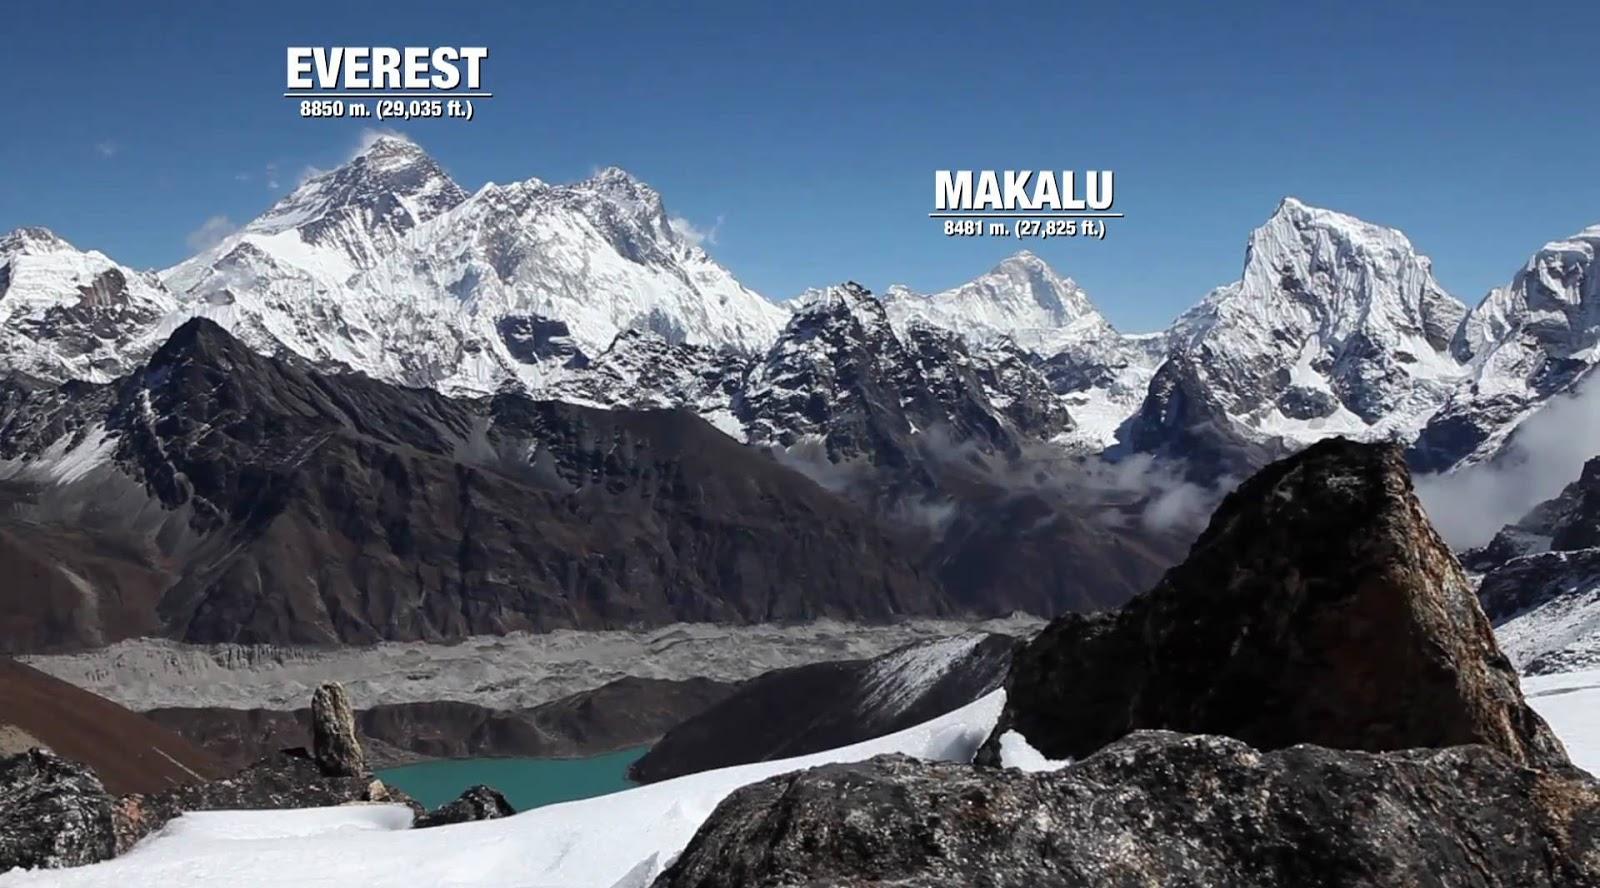 gunung vulkanik tertinggi di dunia gunung2 tertinggi di dunia info gunung tertinggi di dunia